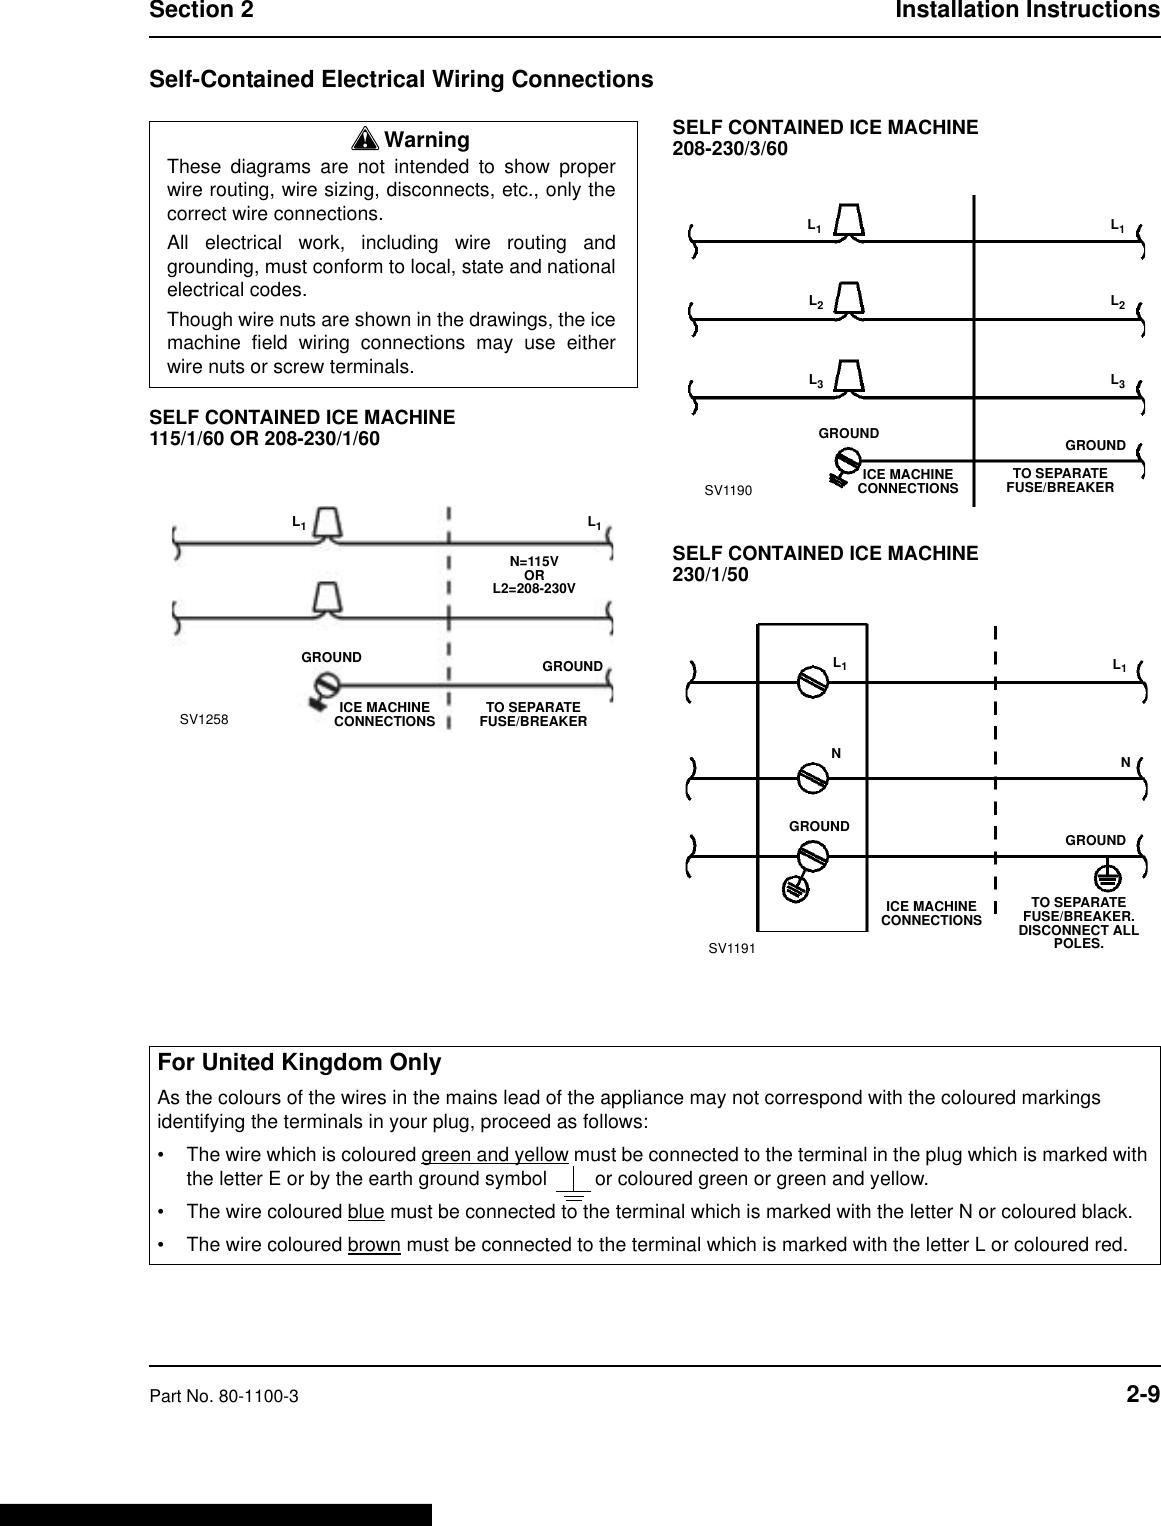 Manitowoc Qr0320A Service Manual 1003440 ManualsLib Makes It ... on